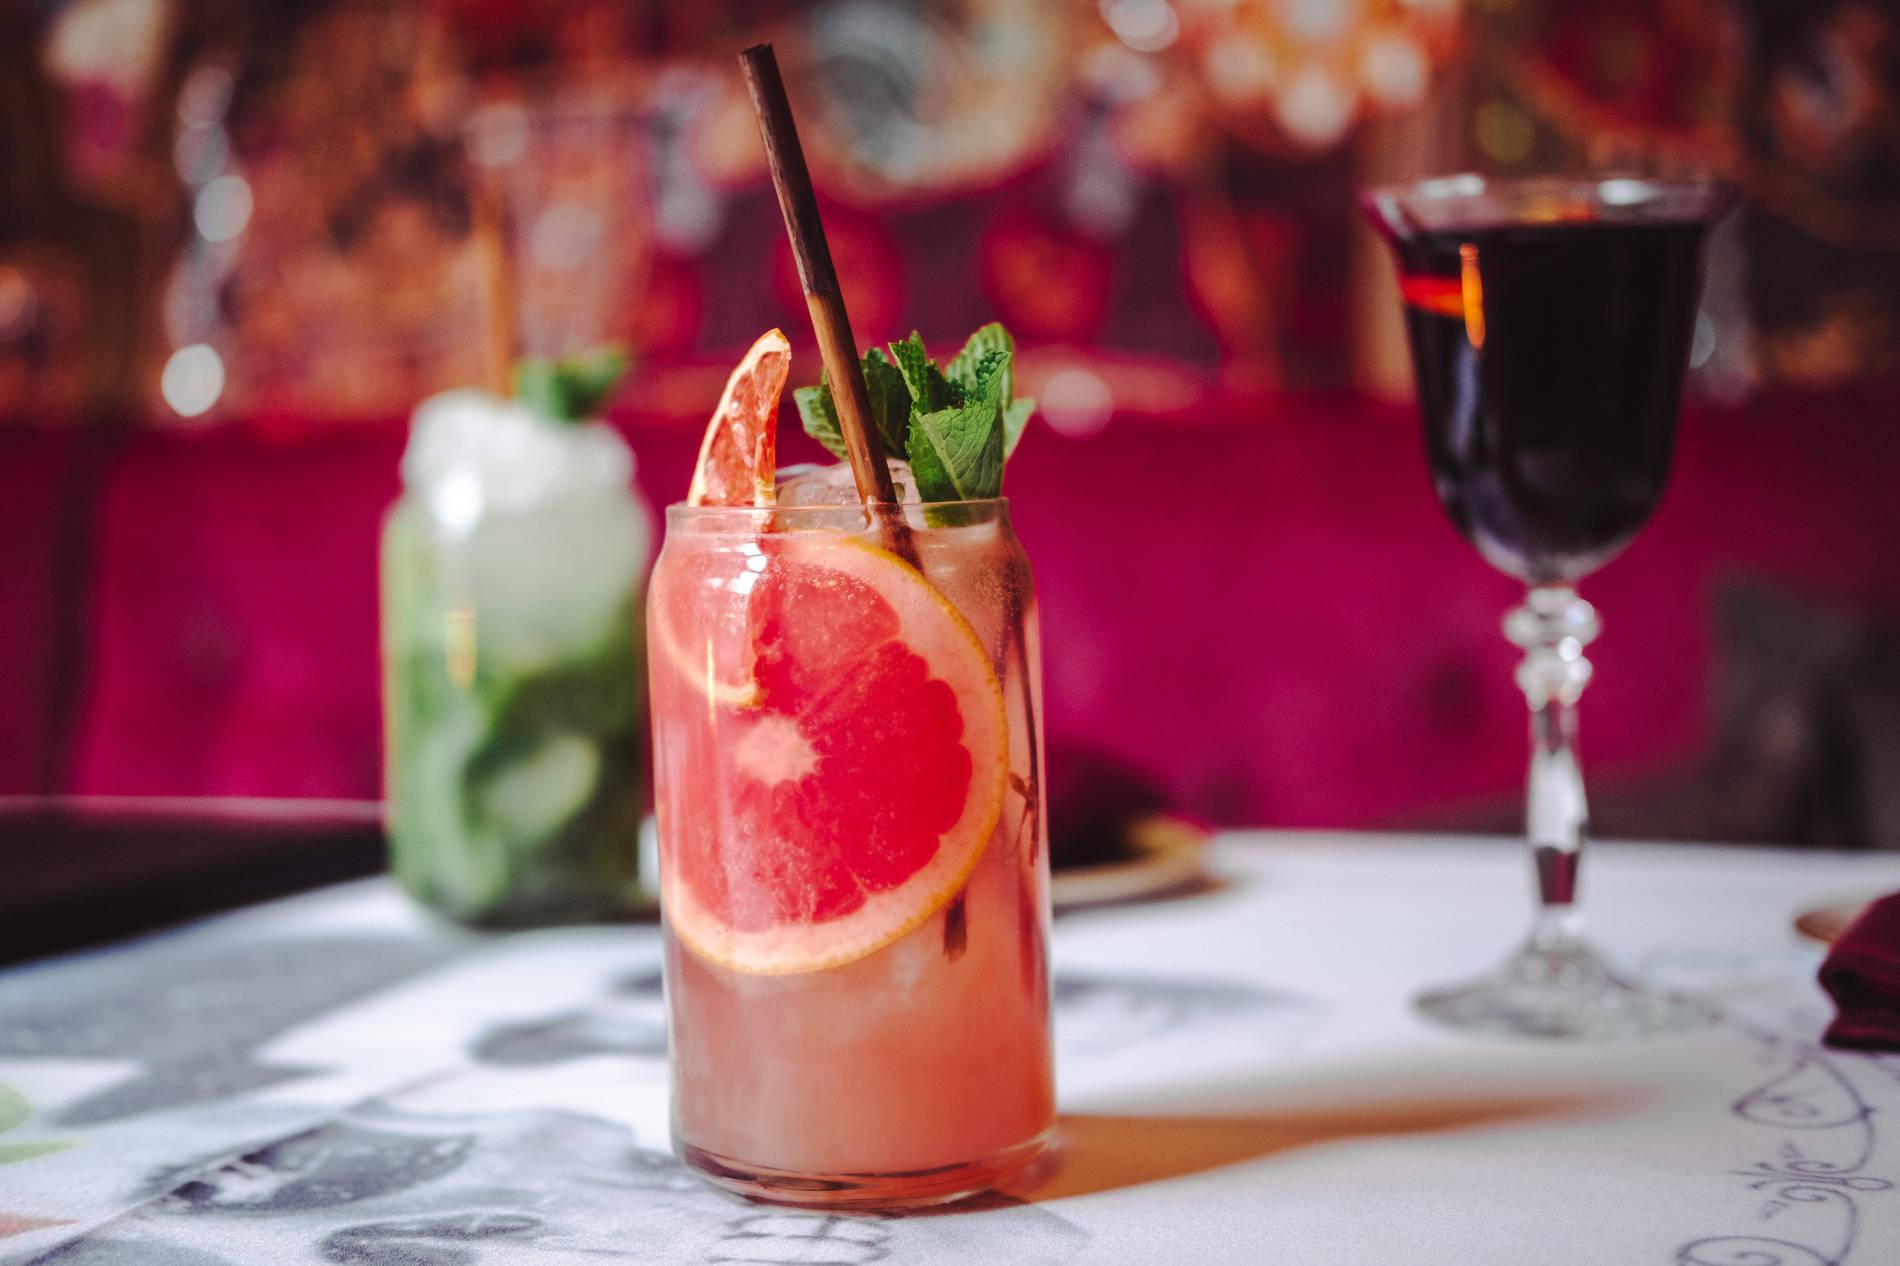 Cocktails in the Manna la Roosa bar in Tallinn, Estonia